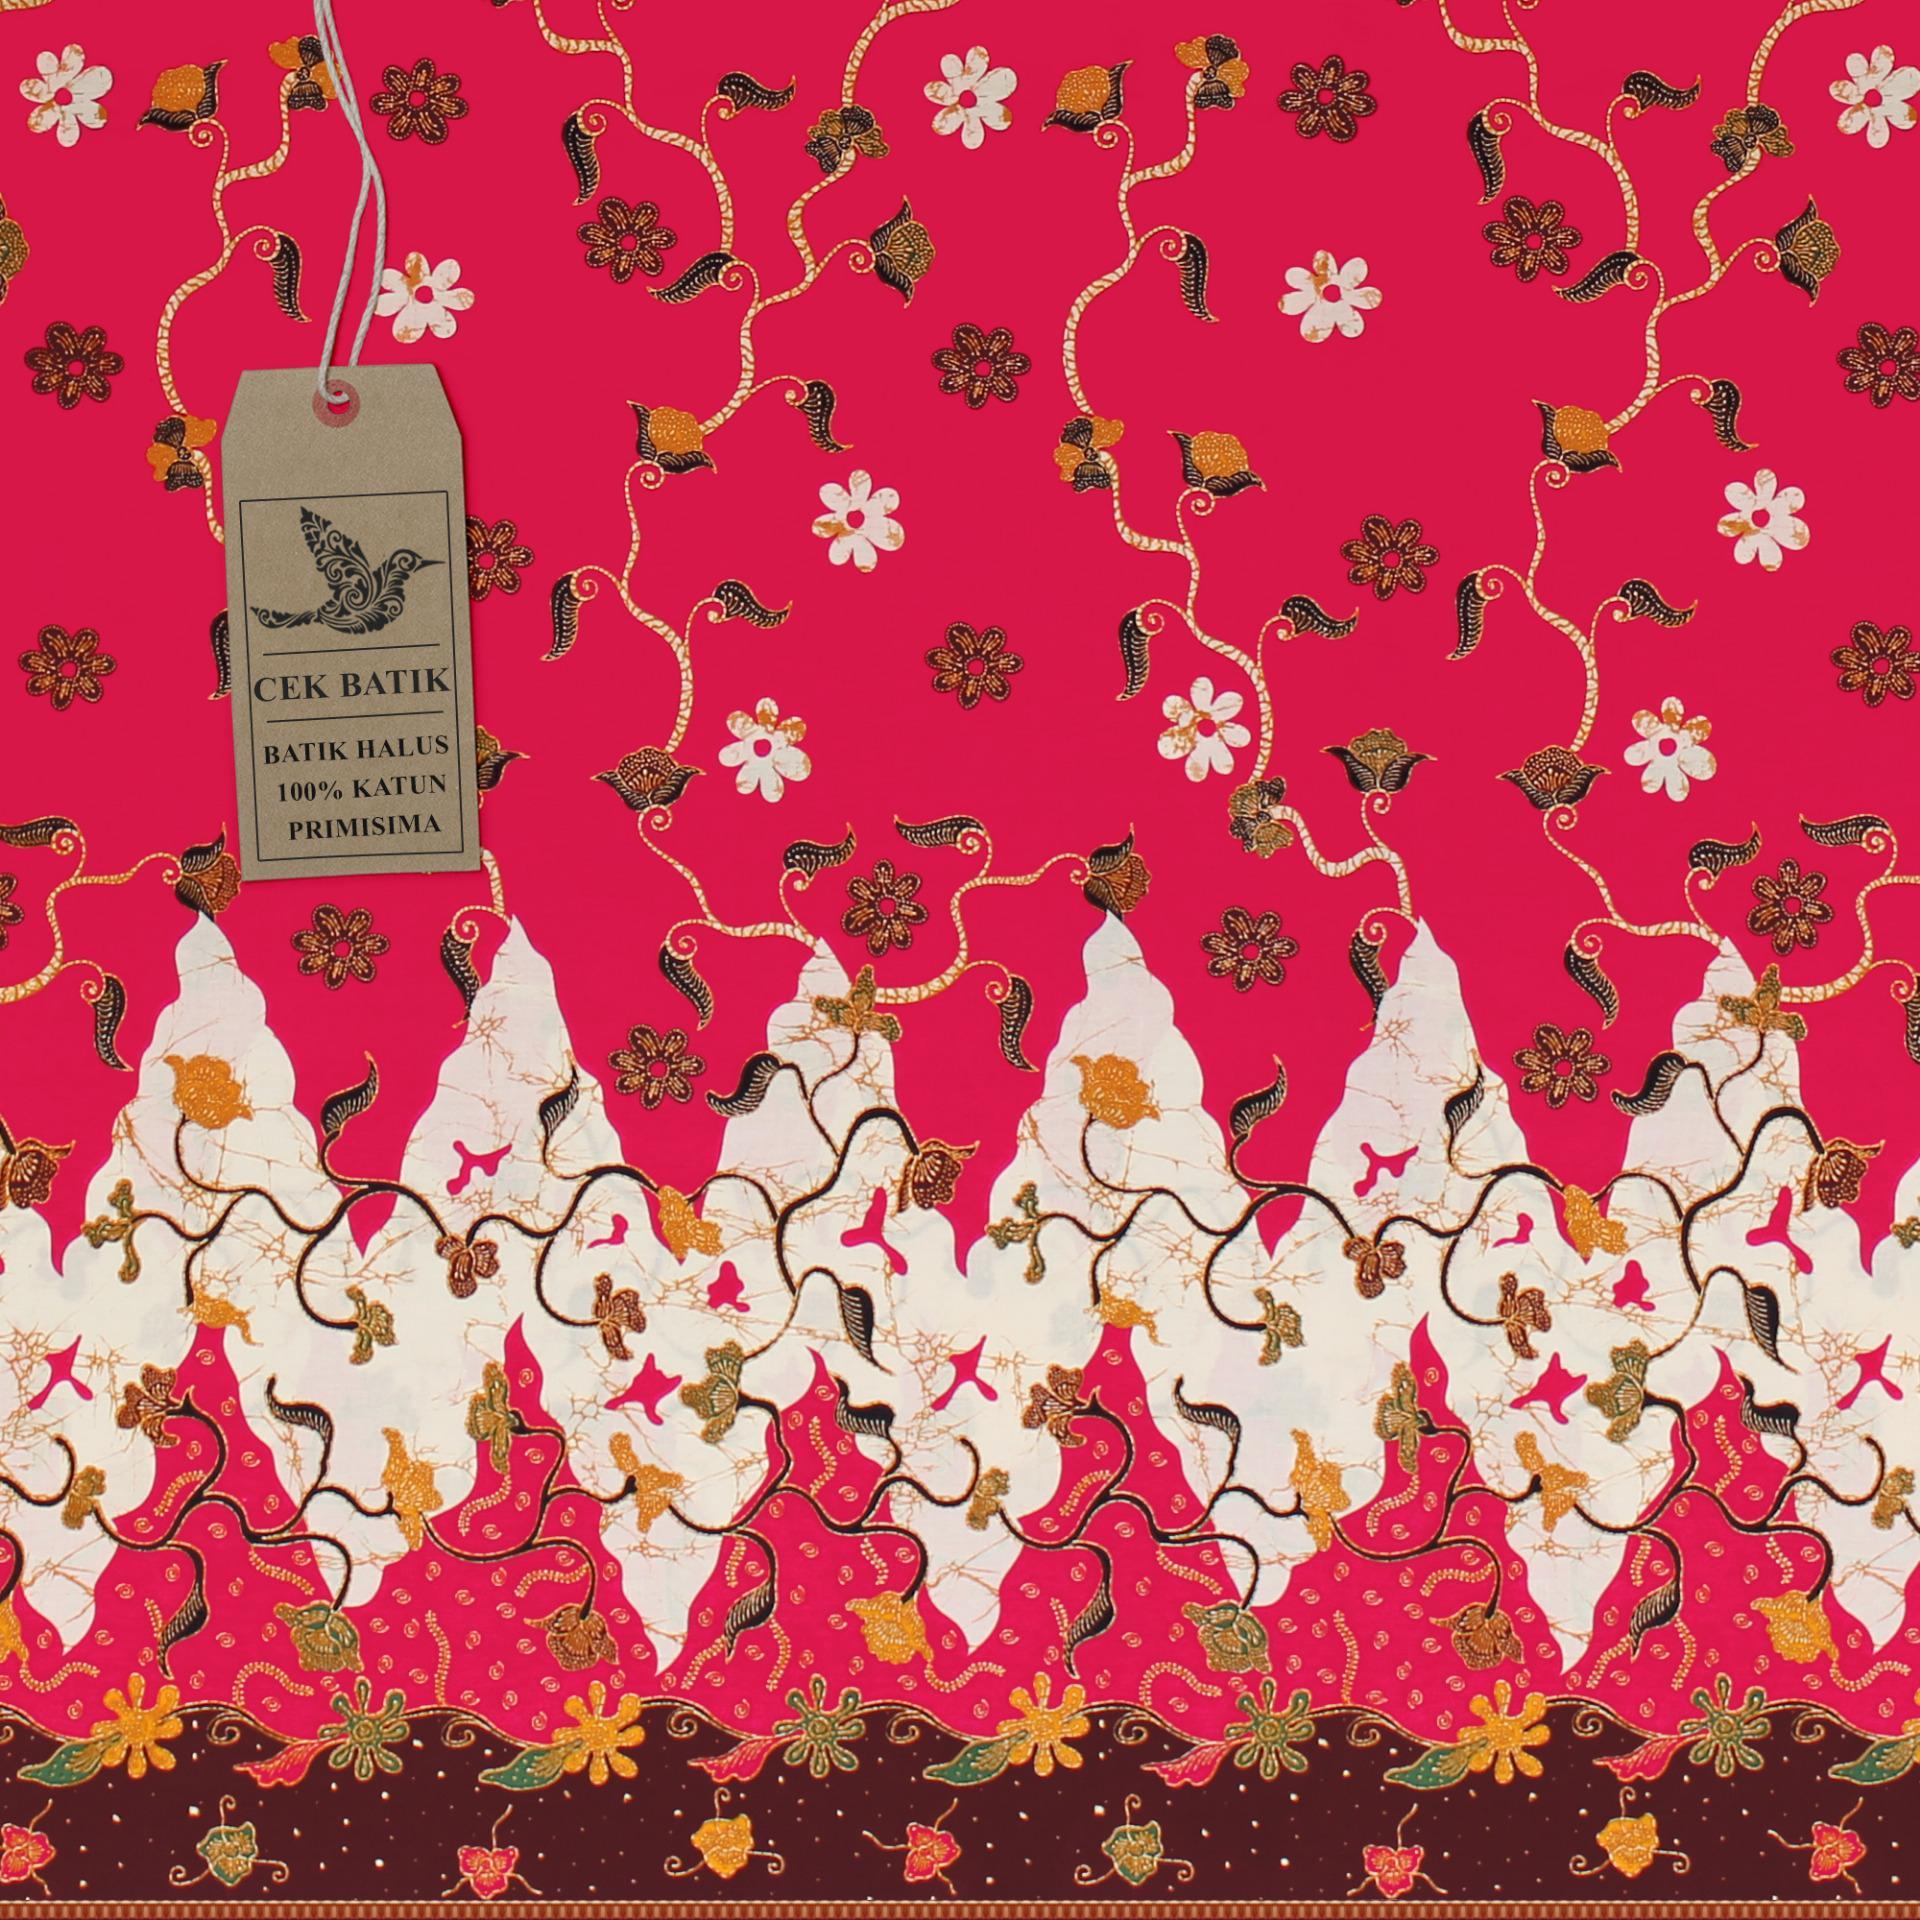 Cek Batik - Kain Batik Motif Paras Madura Bunga Unik (Pink)